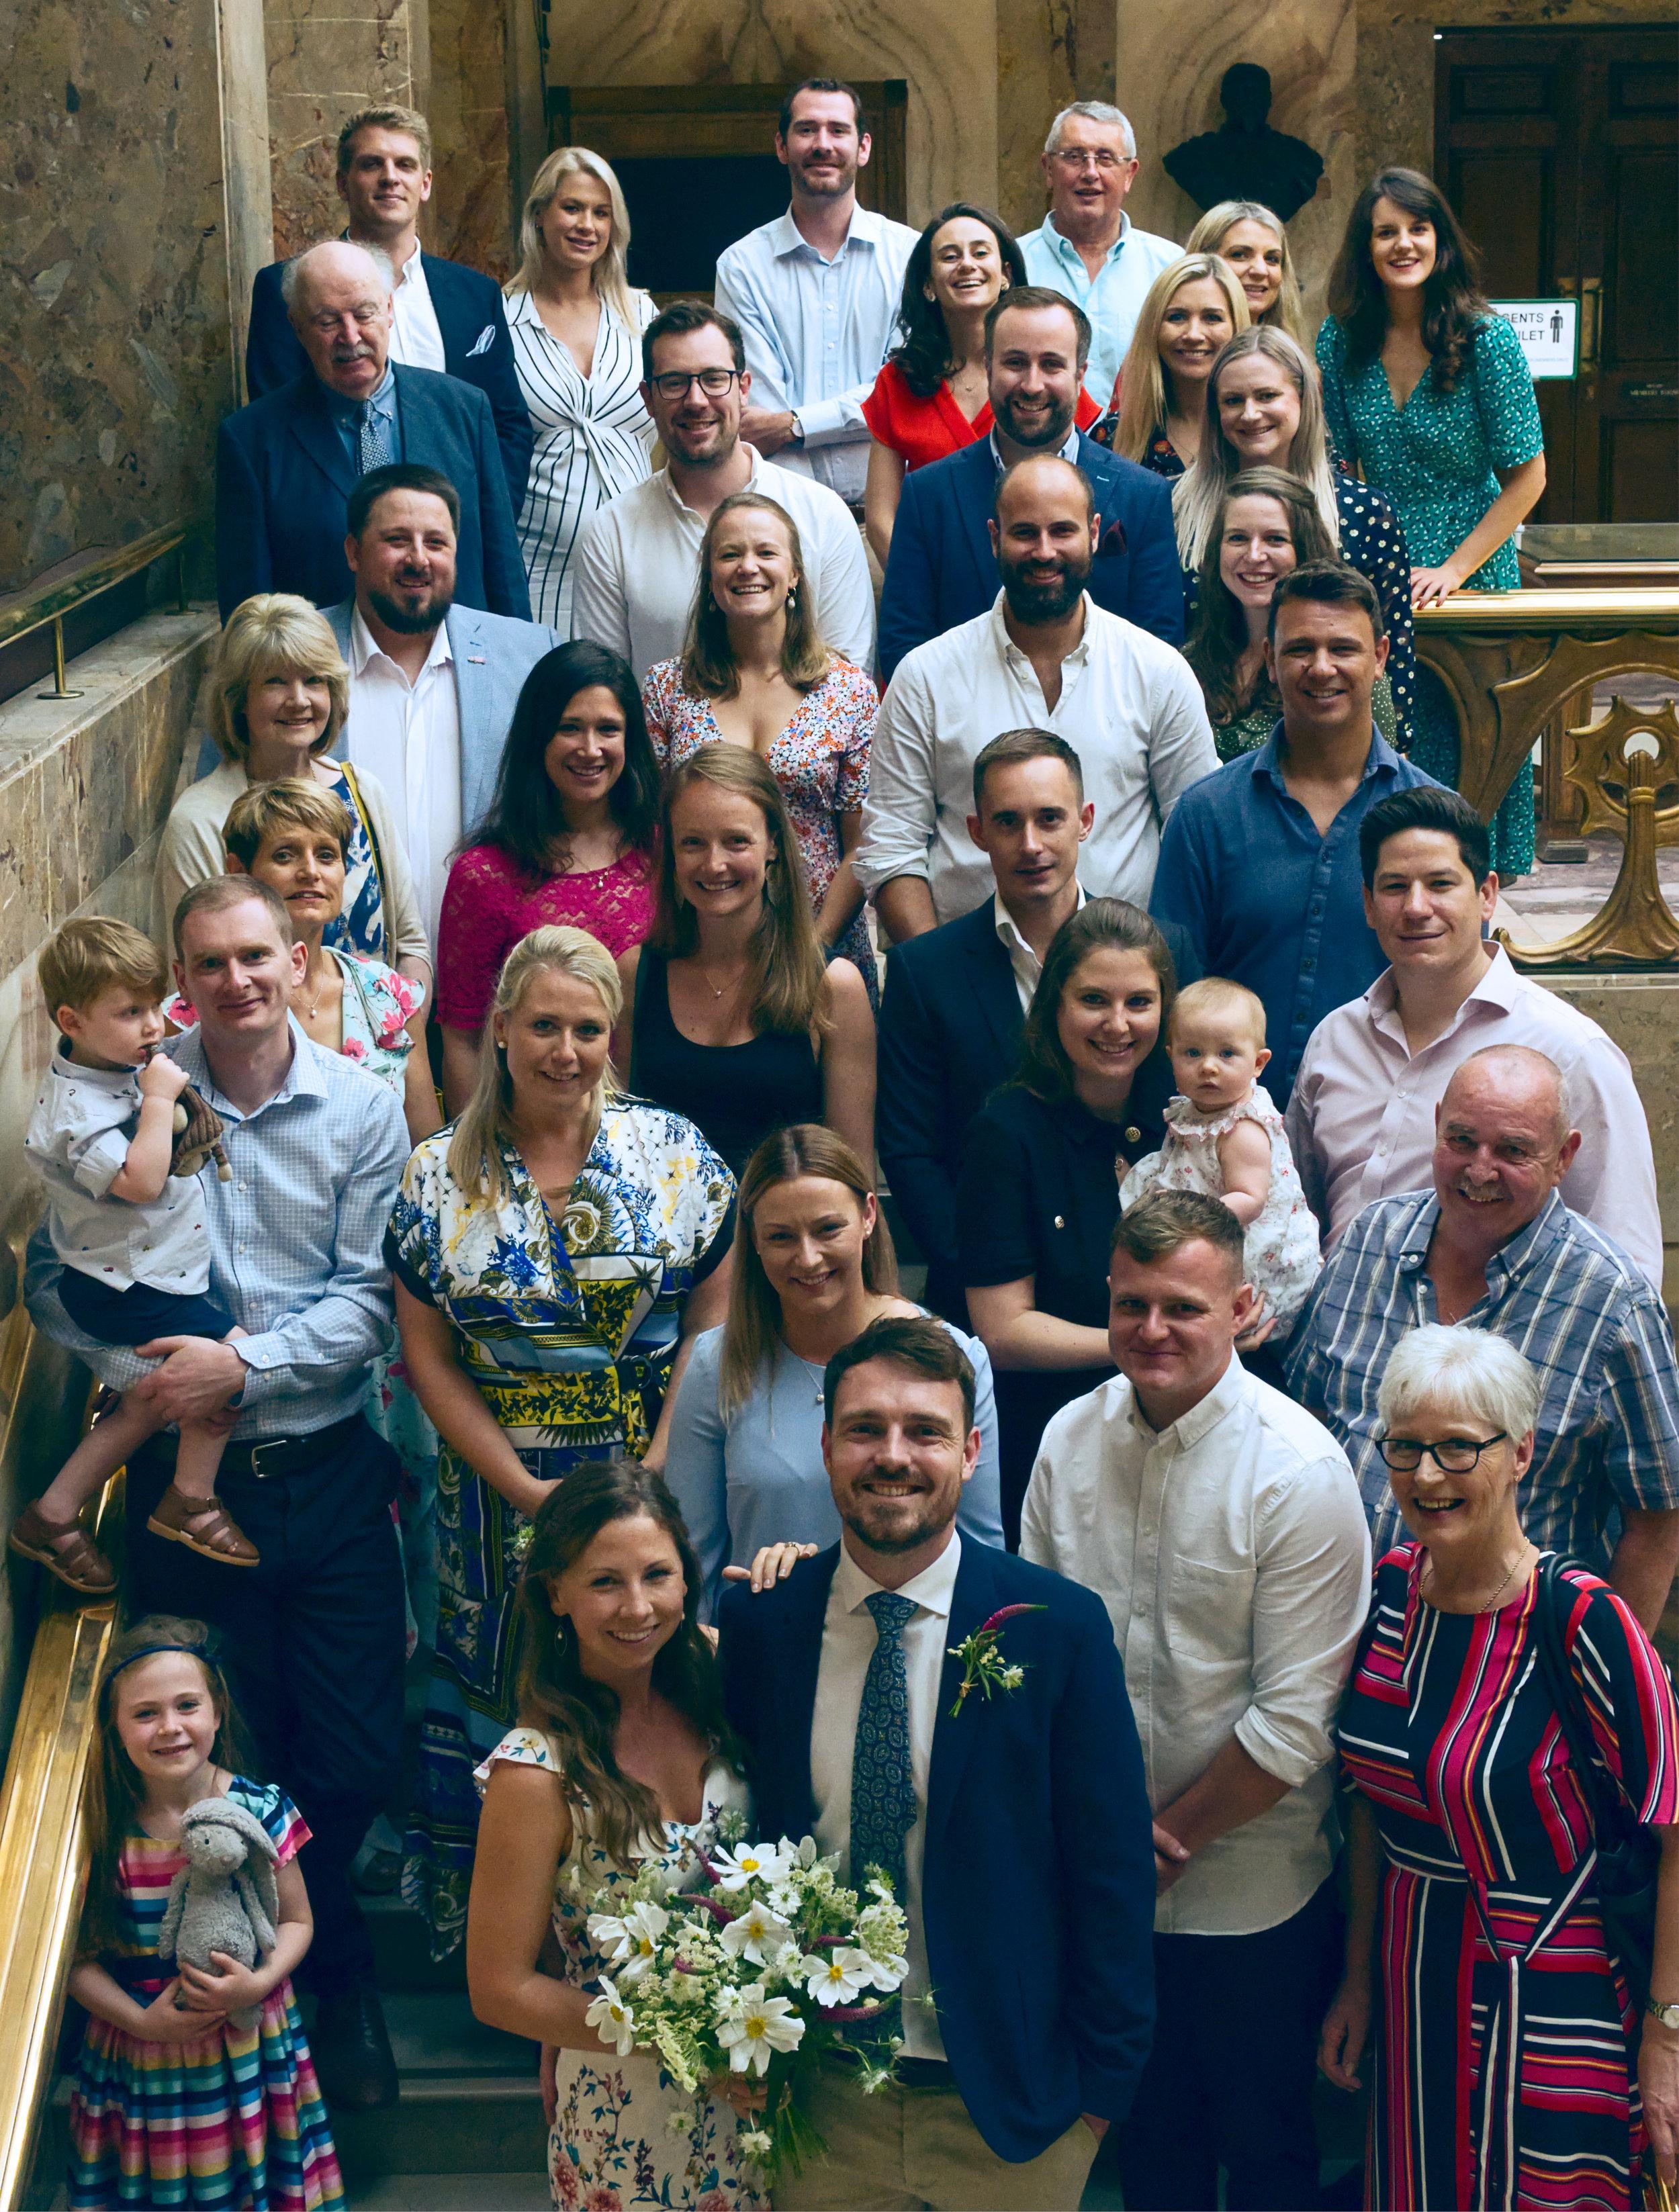 Luke Batchelor Productions V & John KENT Wedding